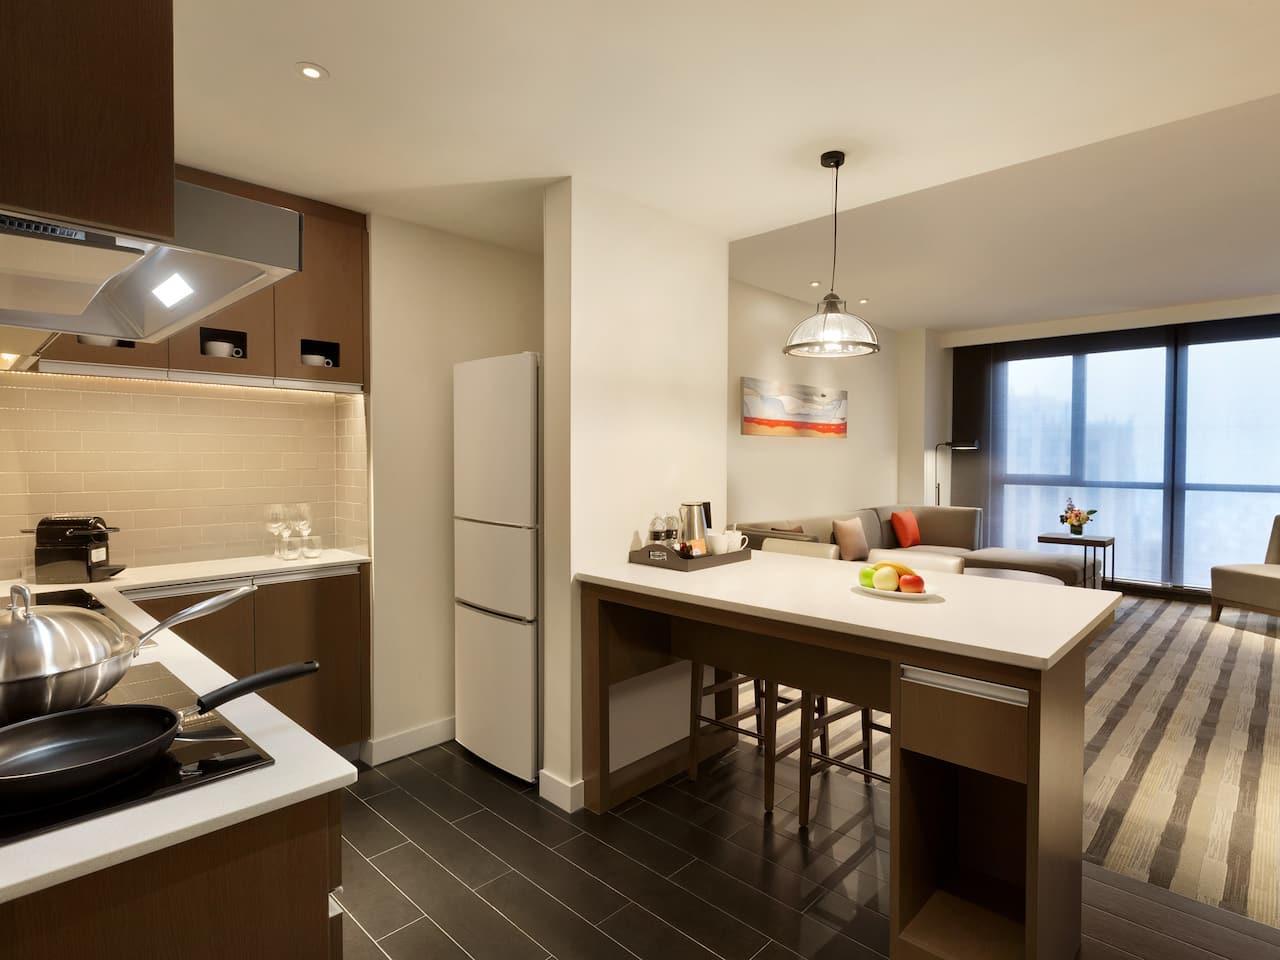 Hyatt House King Kitchen Suite